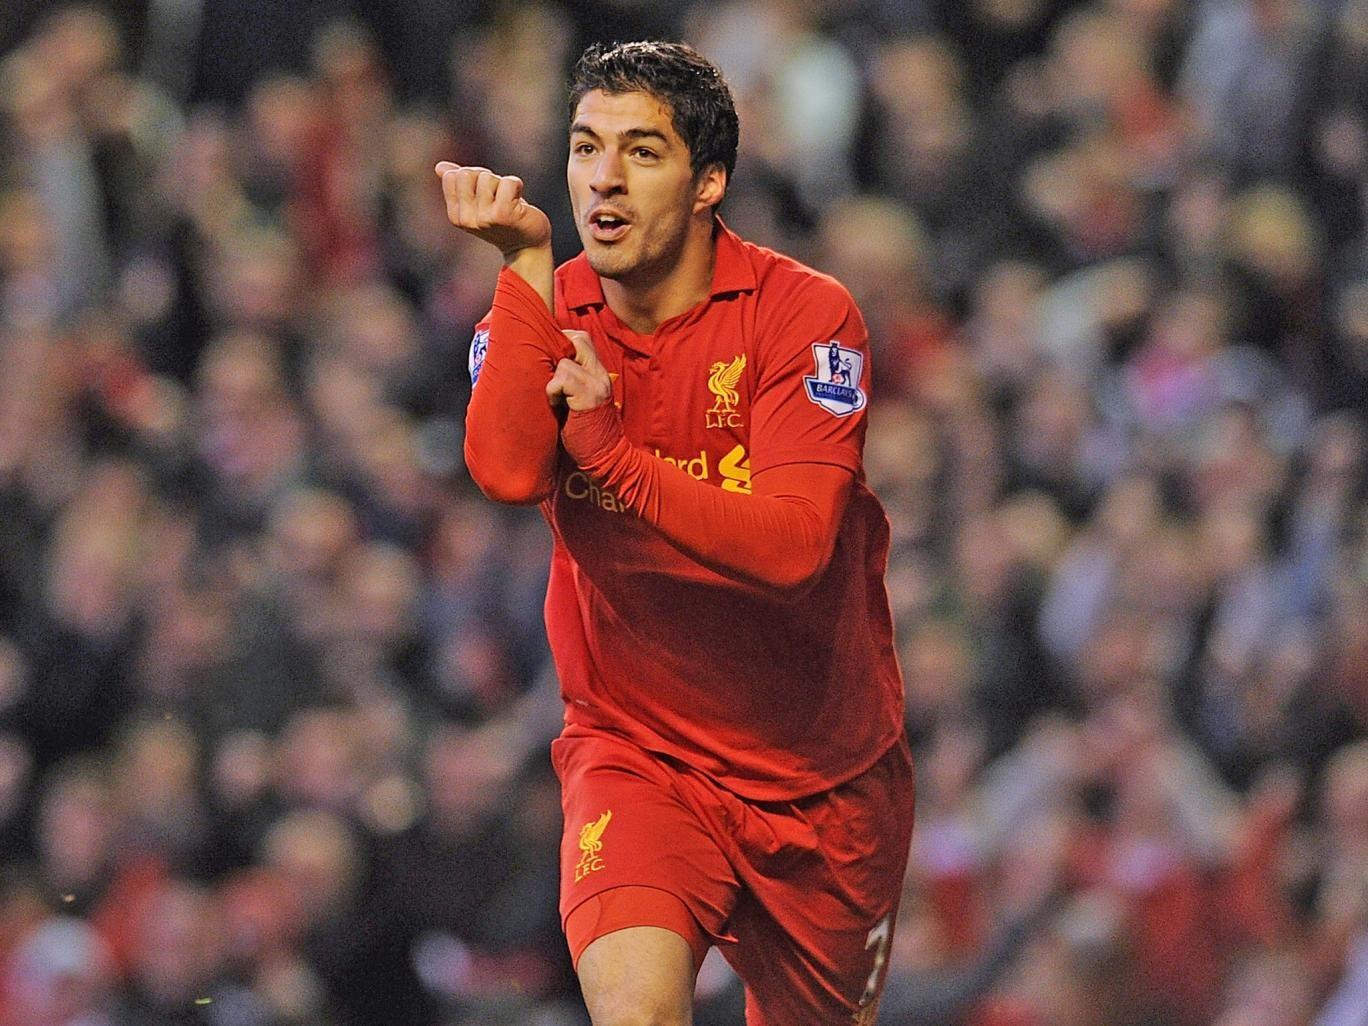 Luis Suarez celebrates scoring for Liverpool